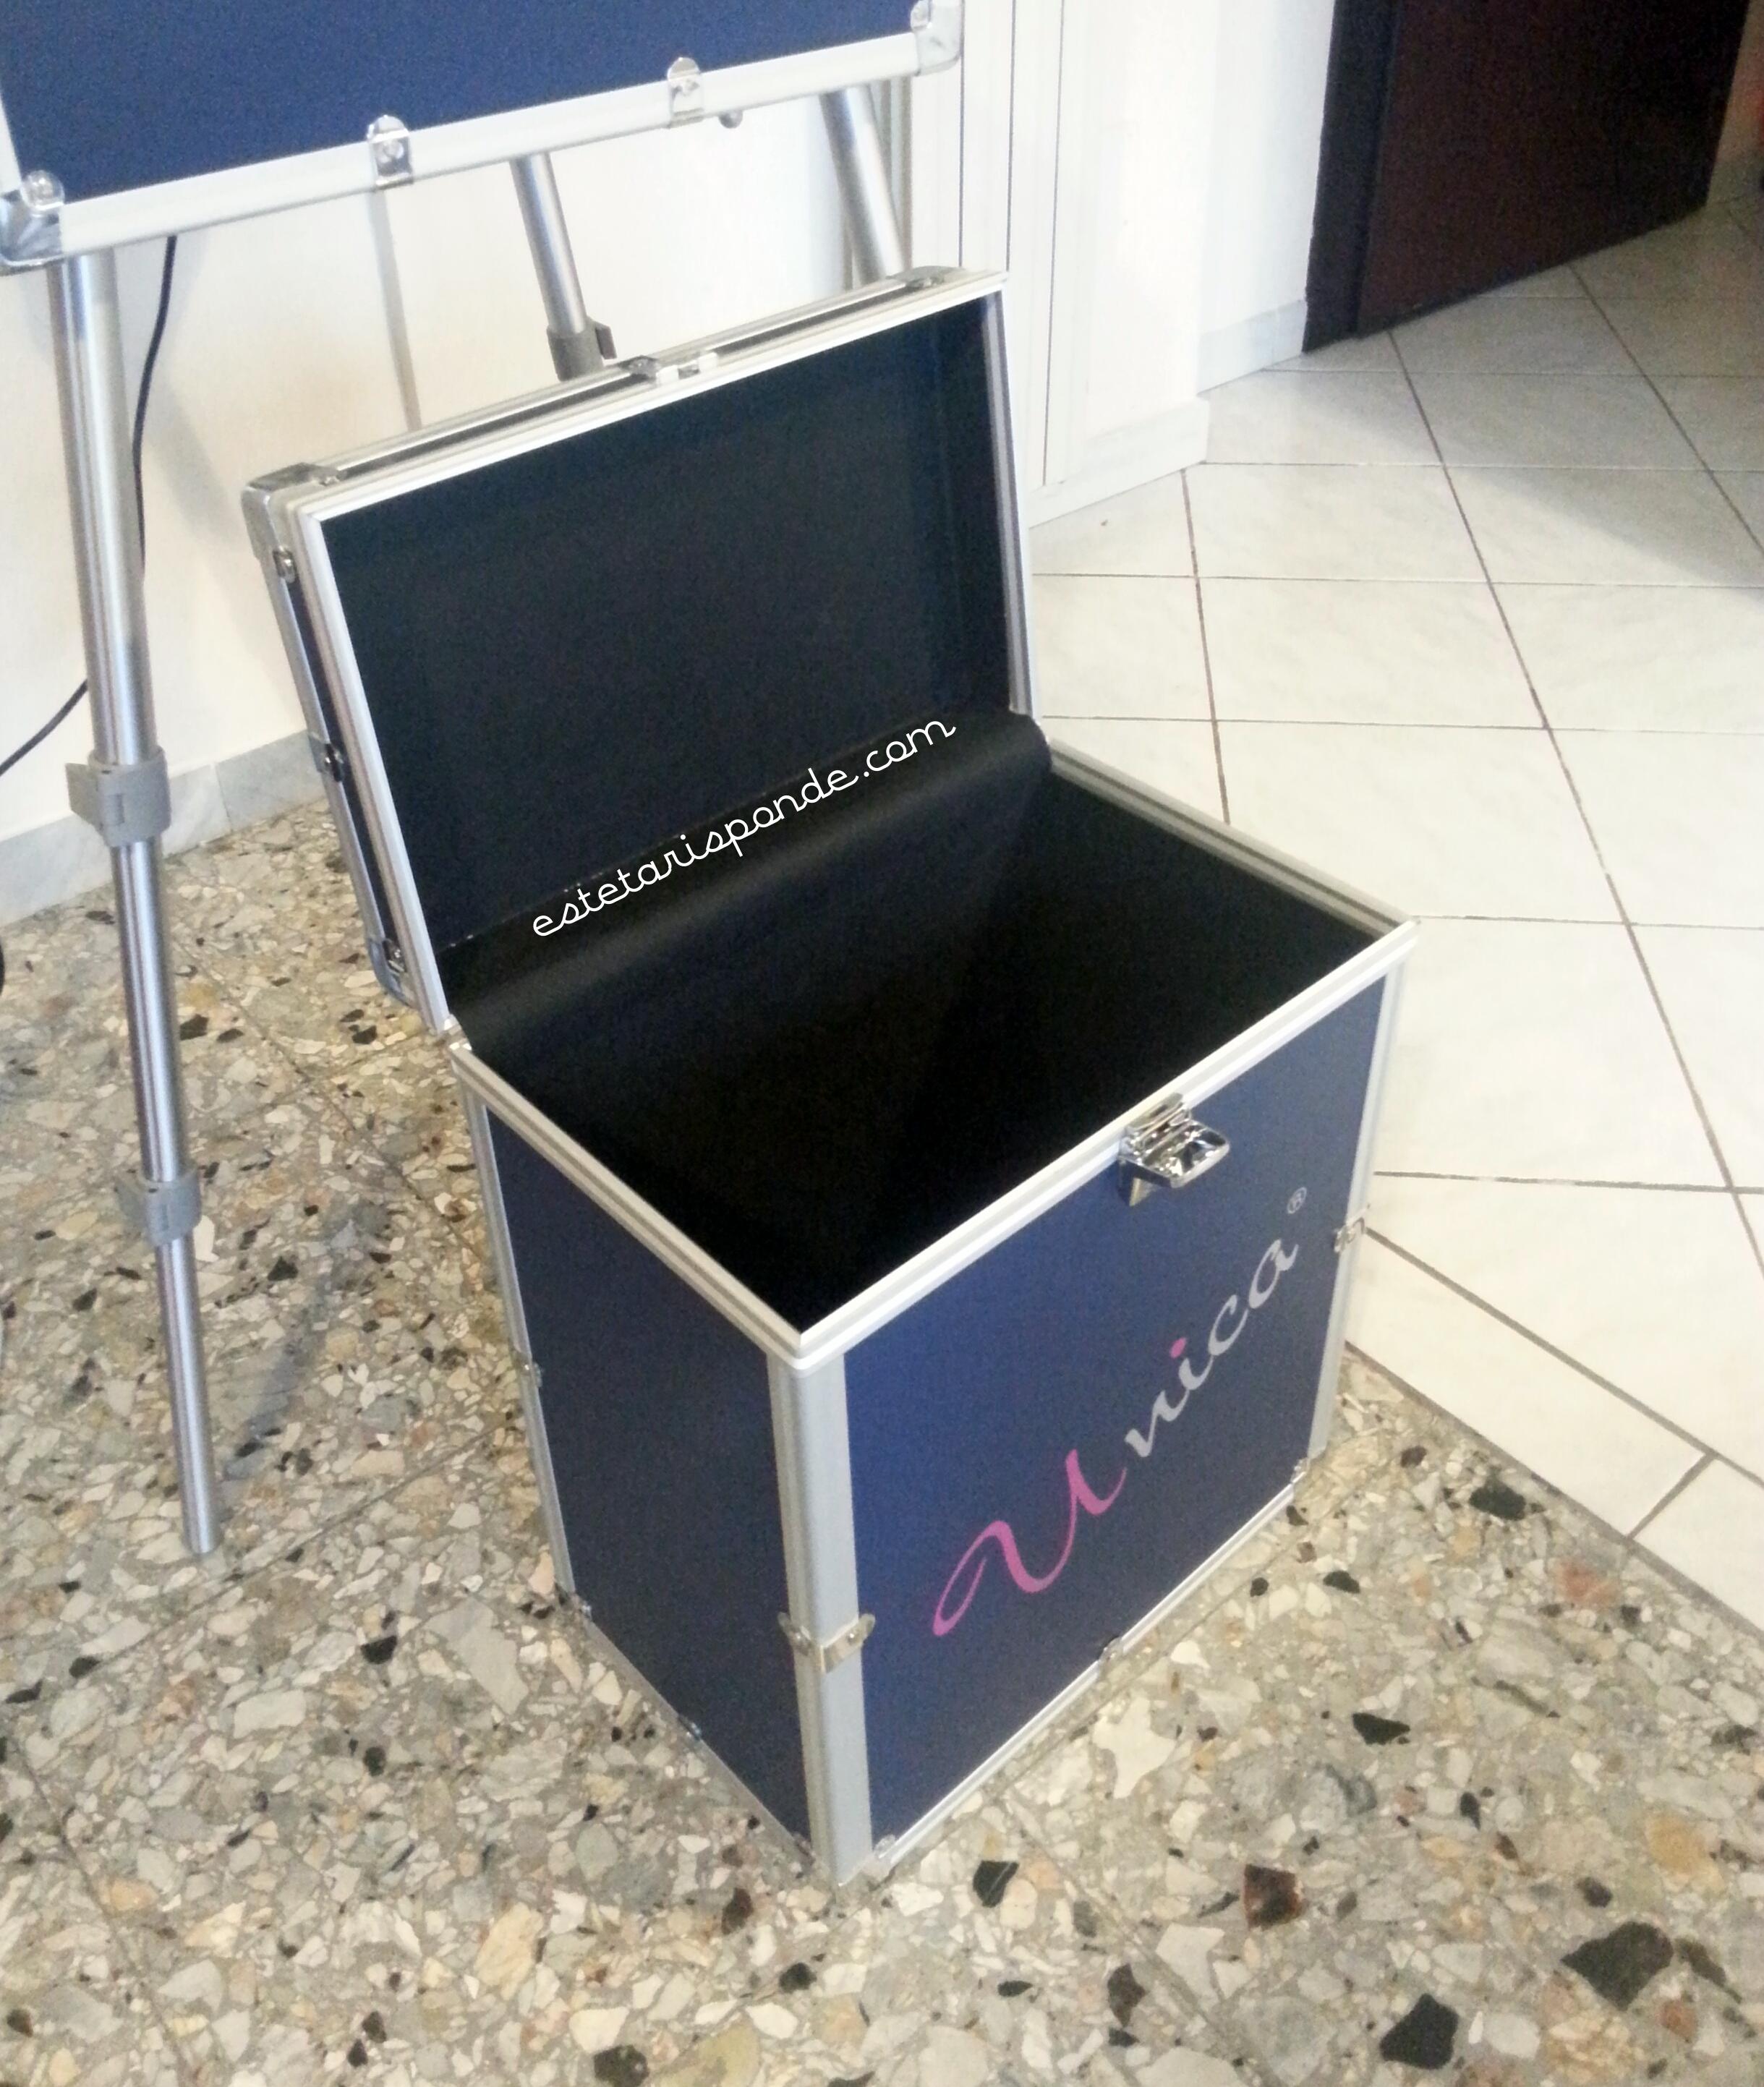 Unica Cantoni makeup stations